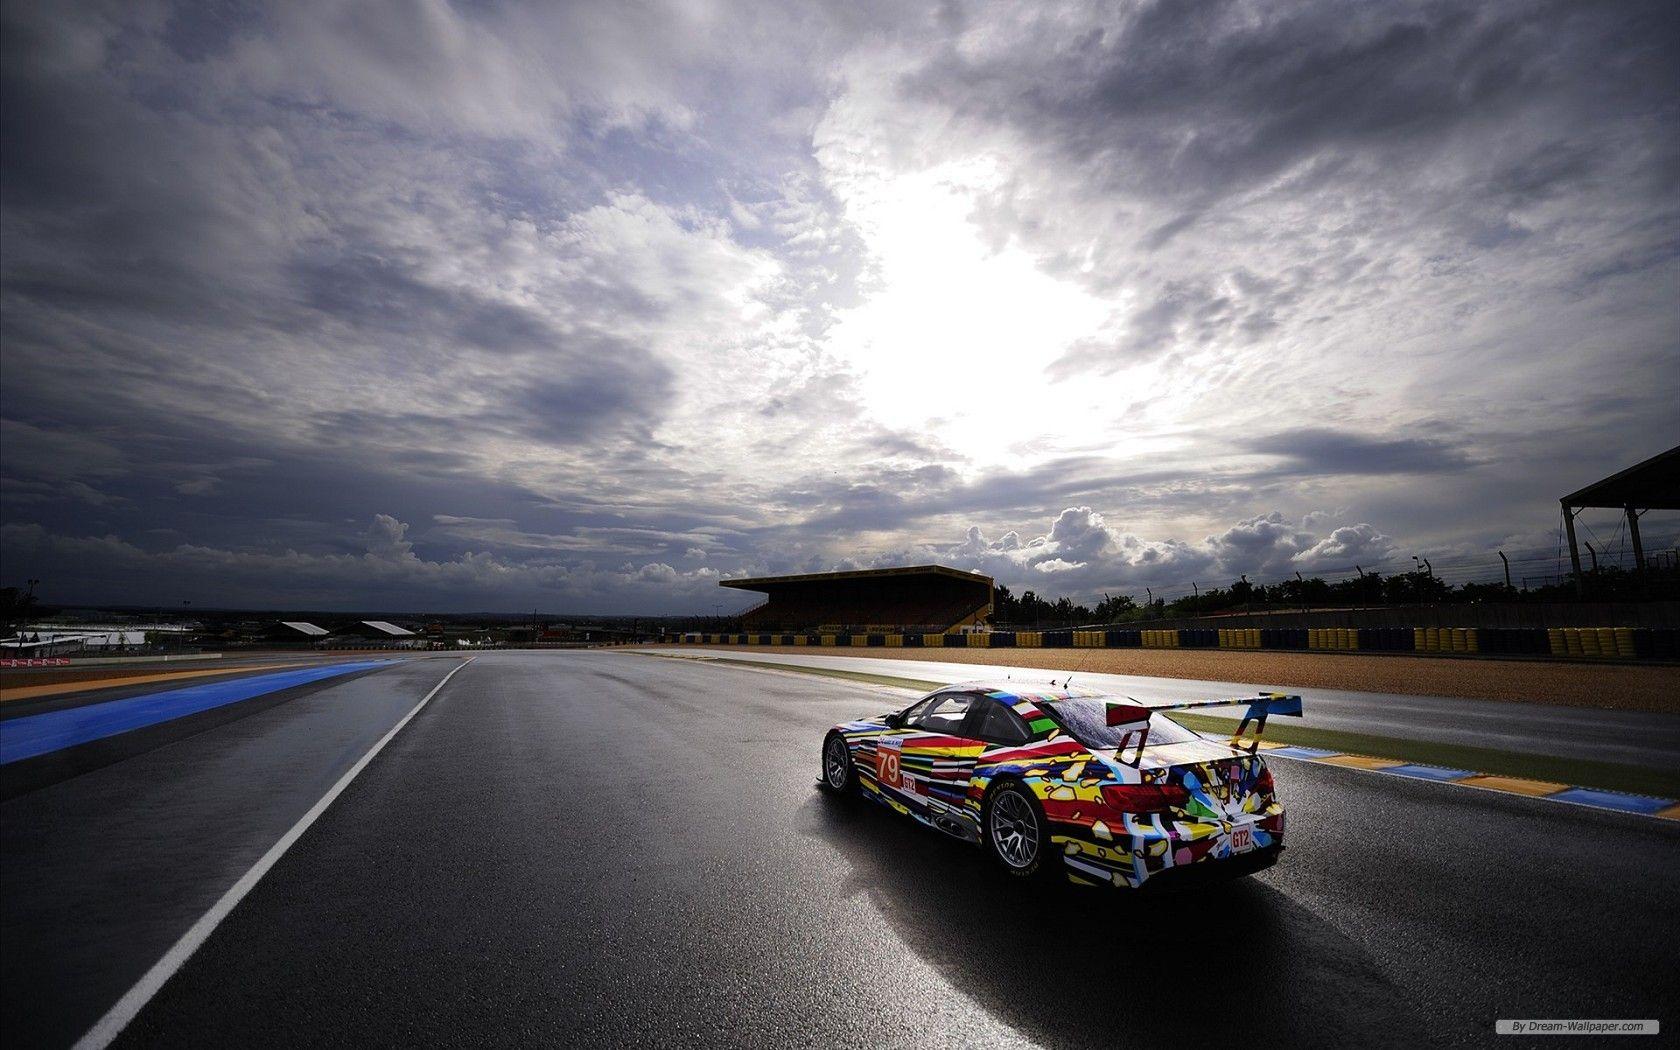 Bmw Art Car At 24 Hour Le Mans Wallpaper Bmw Art Car Art Background Racing